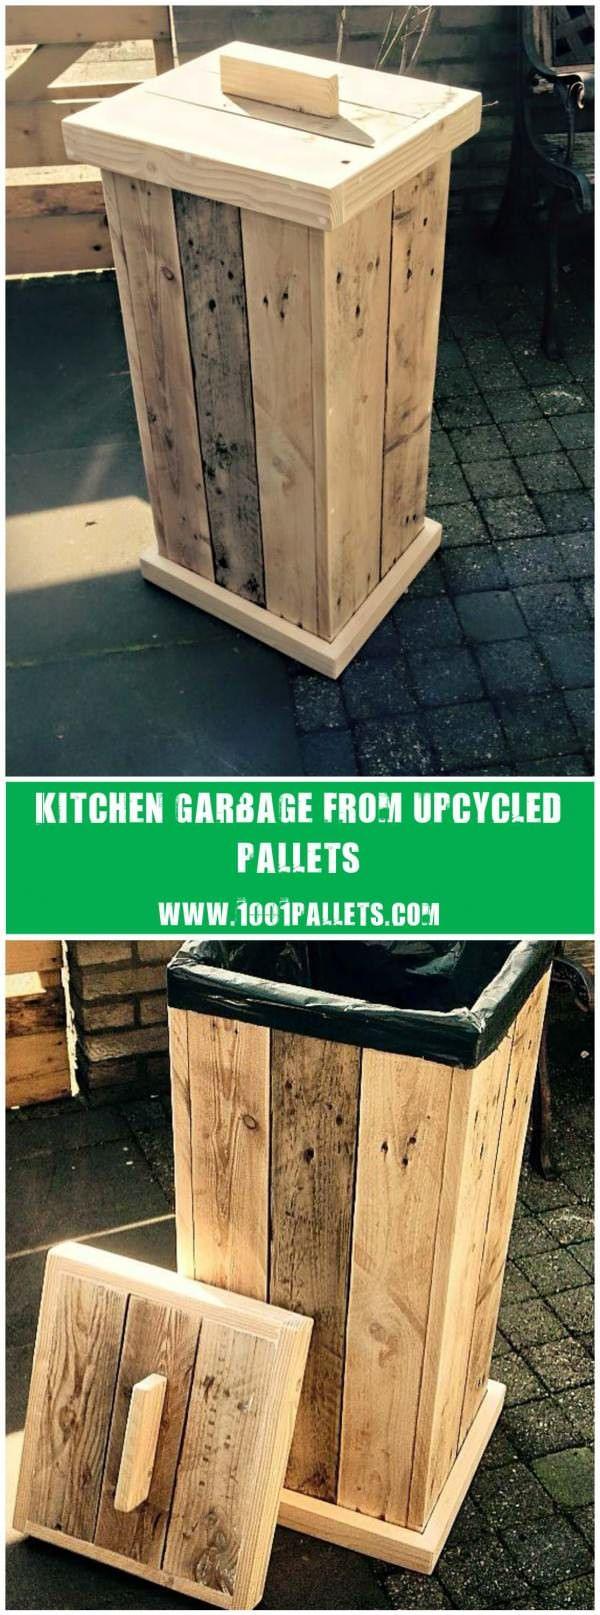 Virtual craft club diy vinyl wood slice sugar bee - Pallet Kitchen Garbage Pallet Craftsdiy